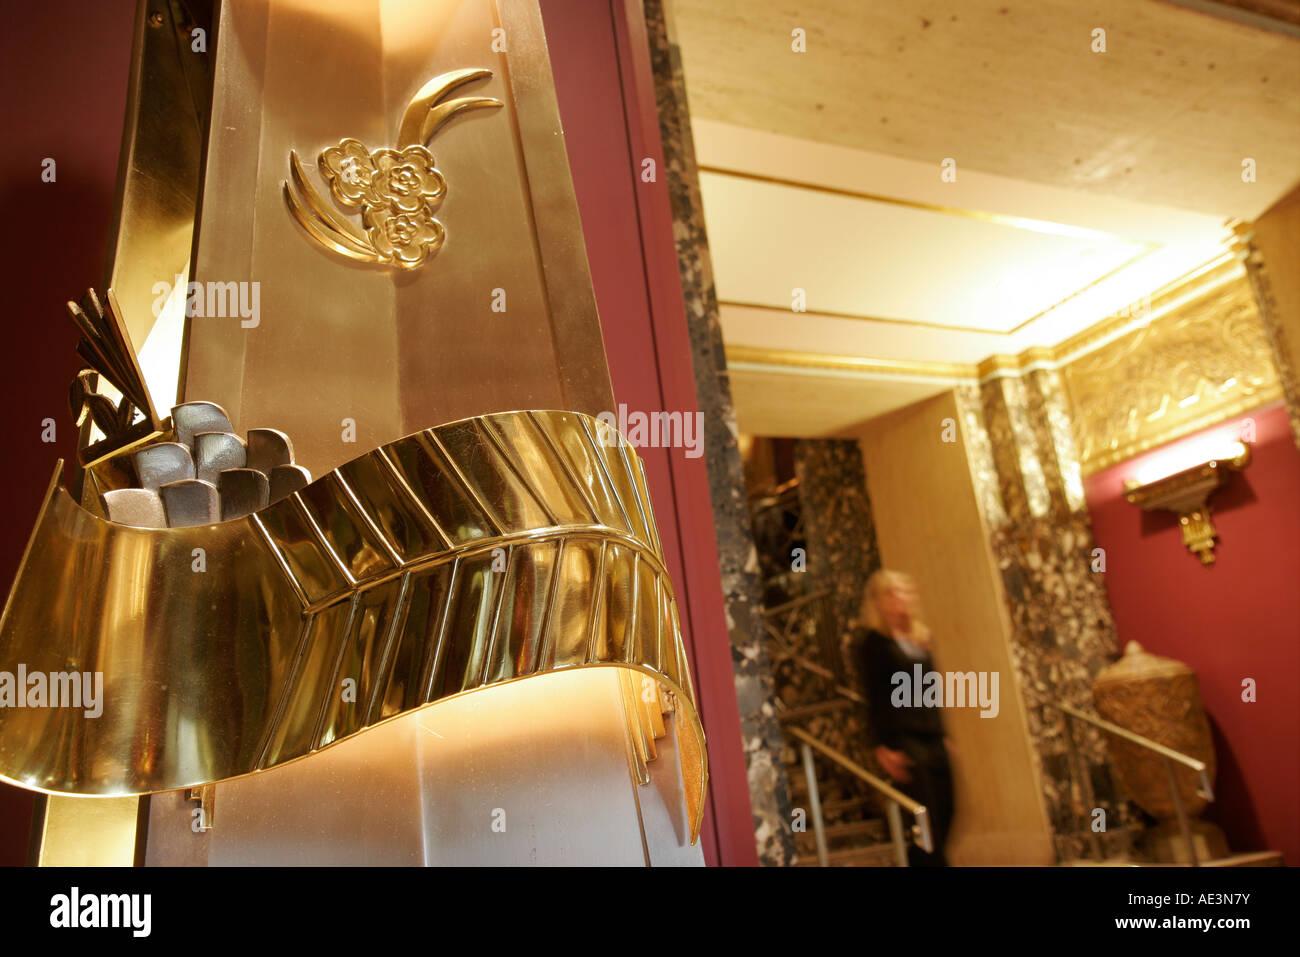 Hilton netherland plaza stock photos hilton netherland - Interior car detailing cincinnati ...